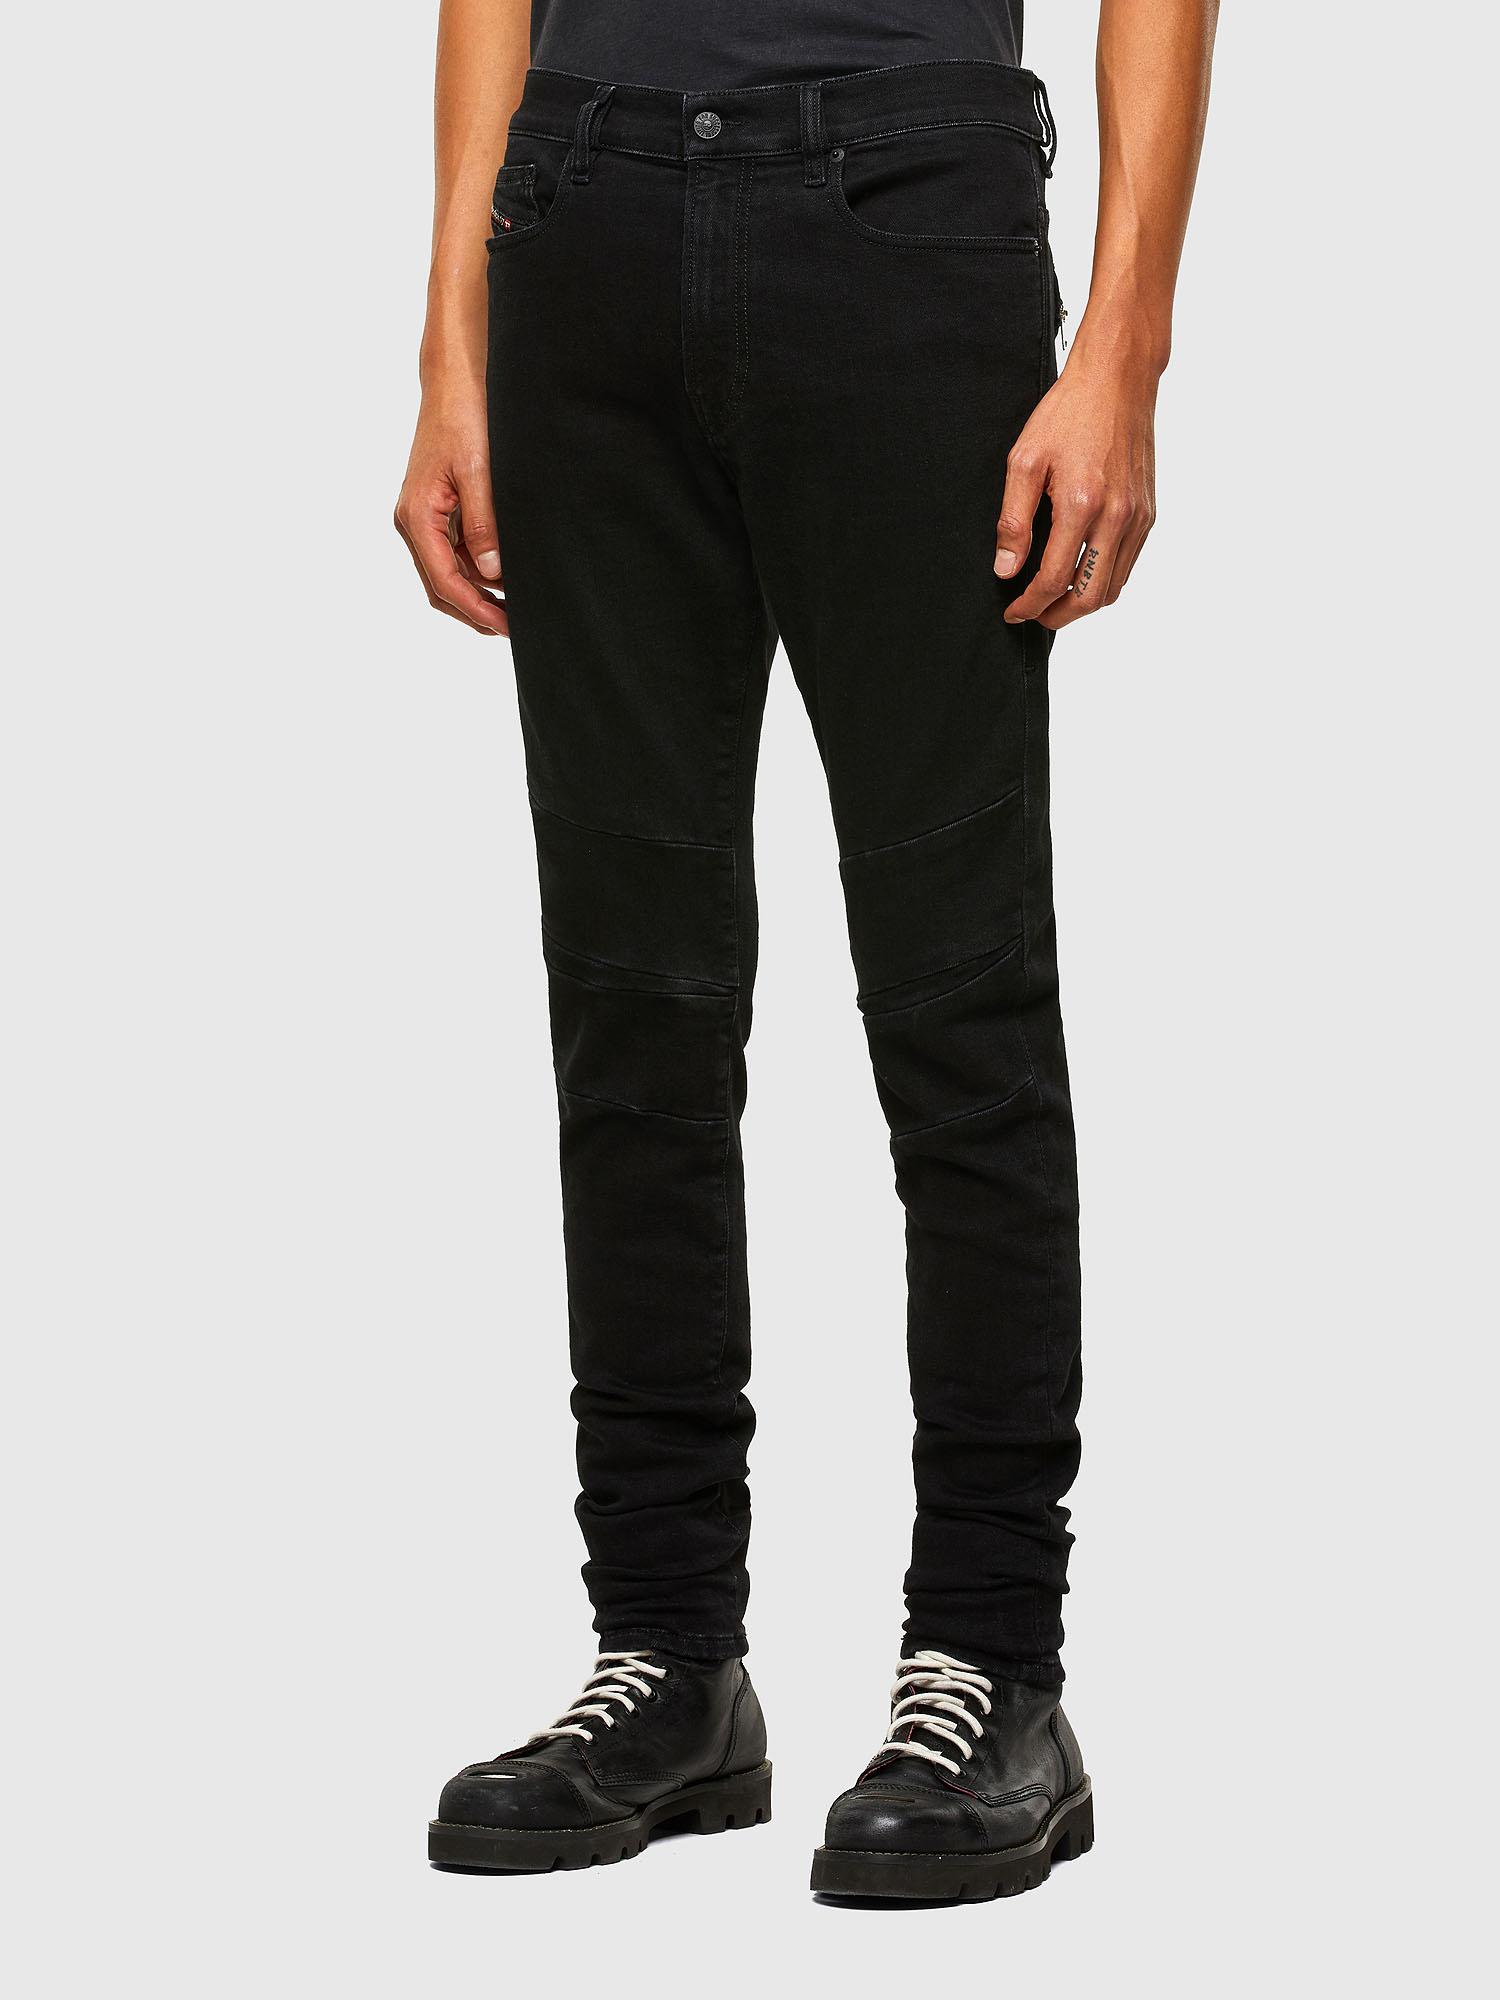 Diesel - D-Amny 009RB, Black/Dark grey - Jeans - Image 7